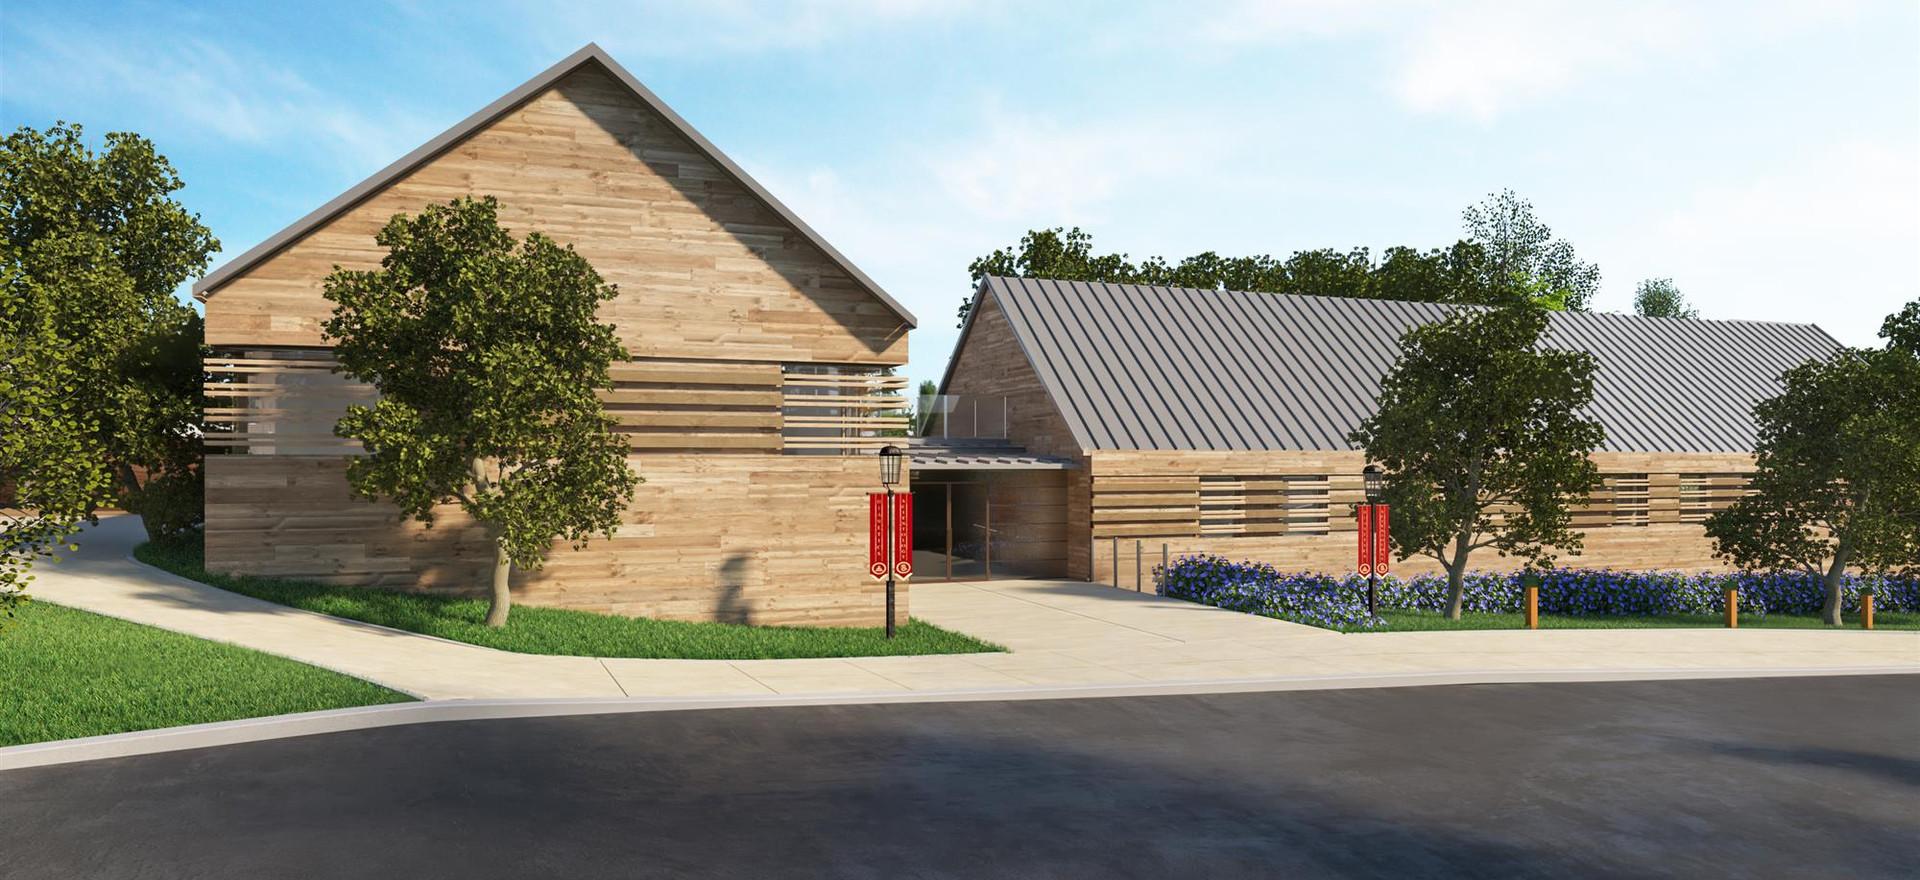 New Purpose Building, East Grinstead